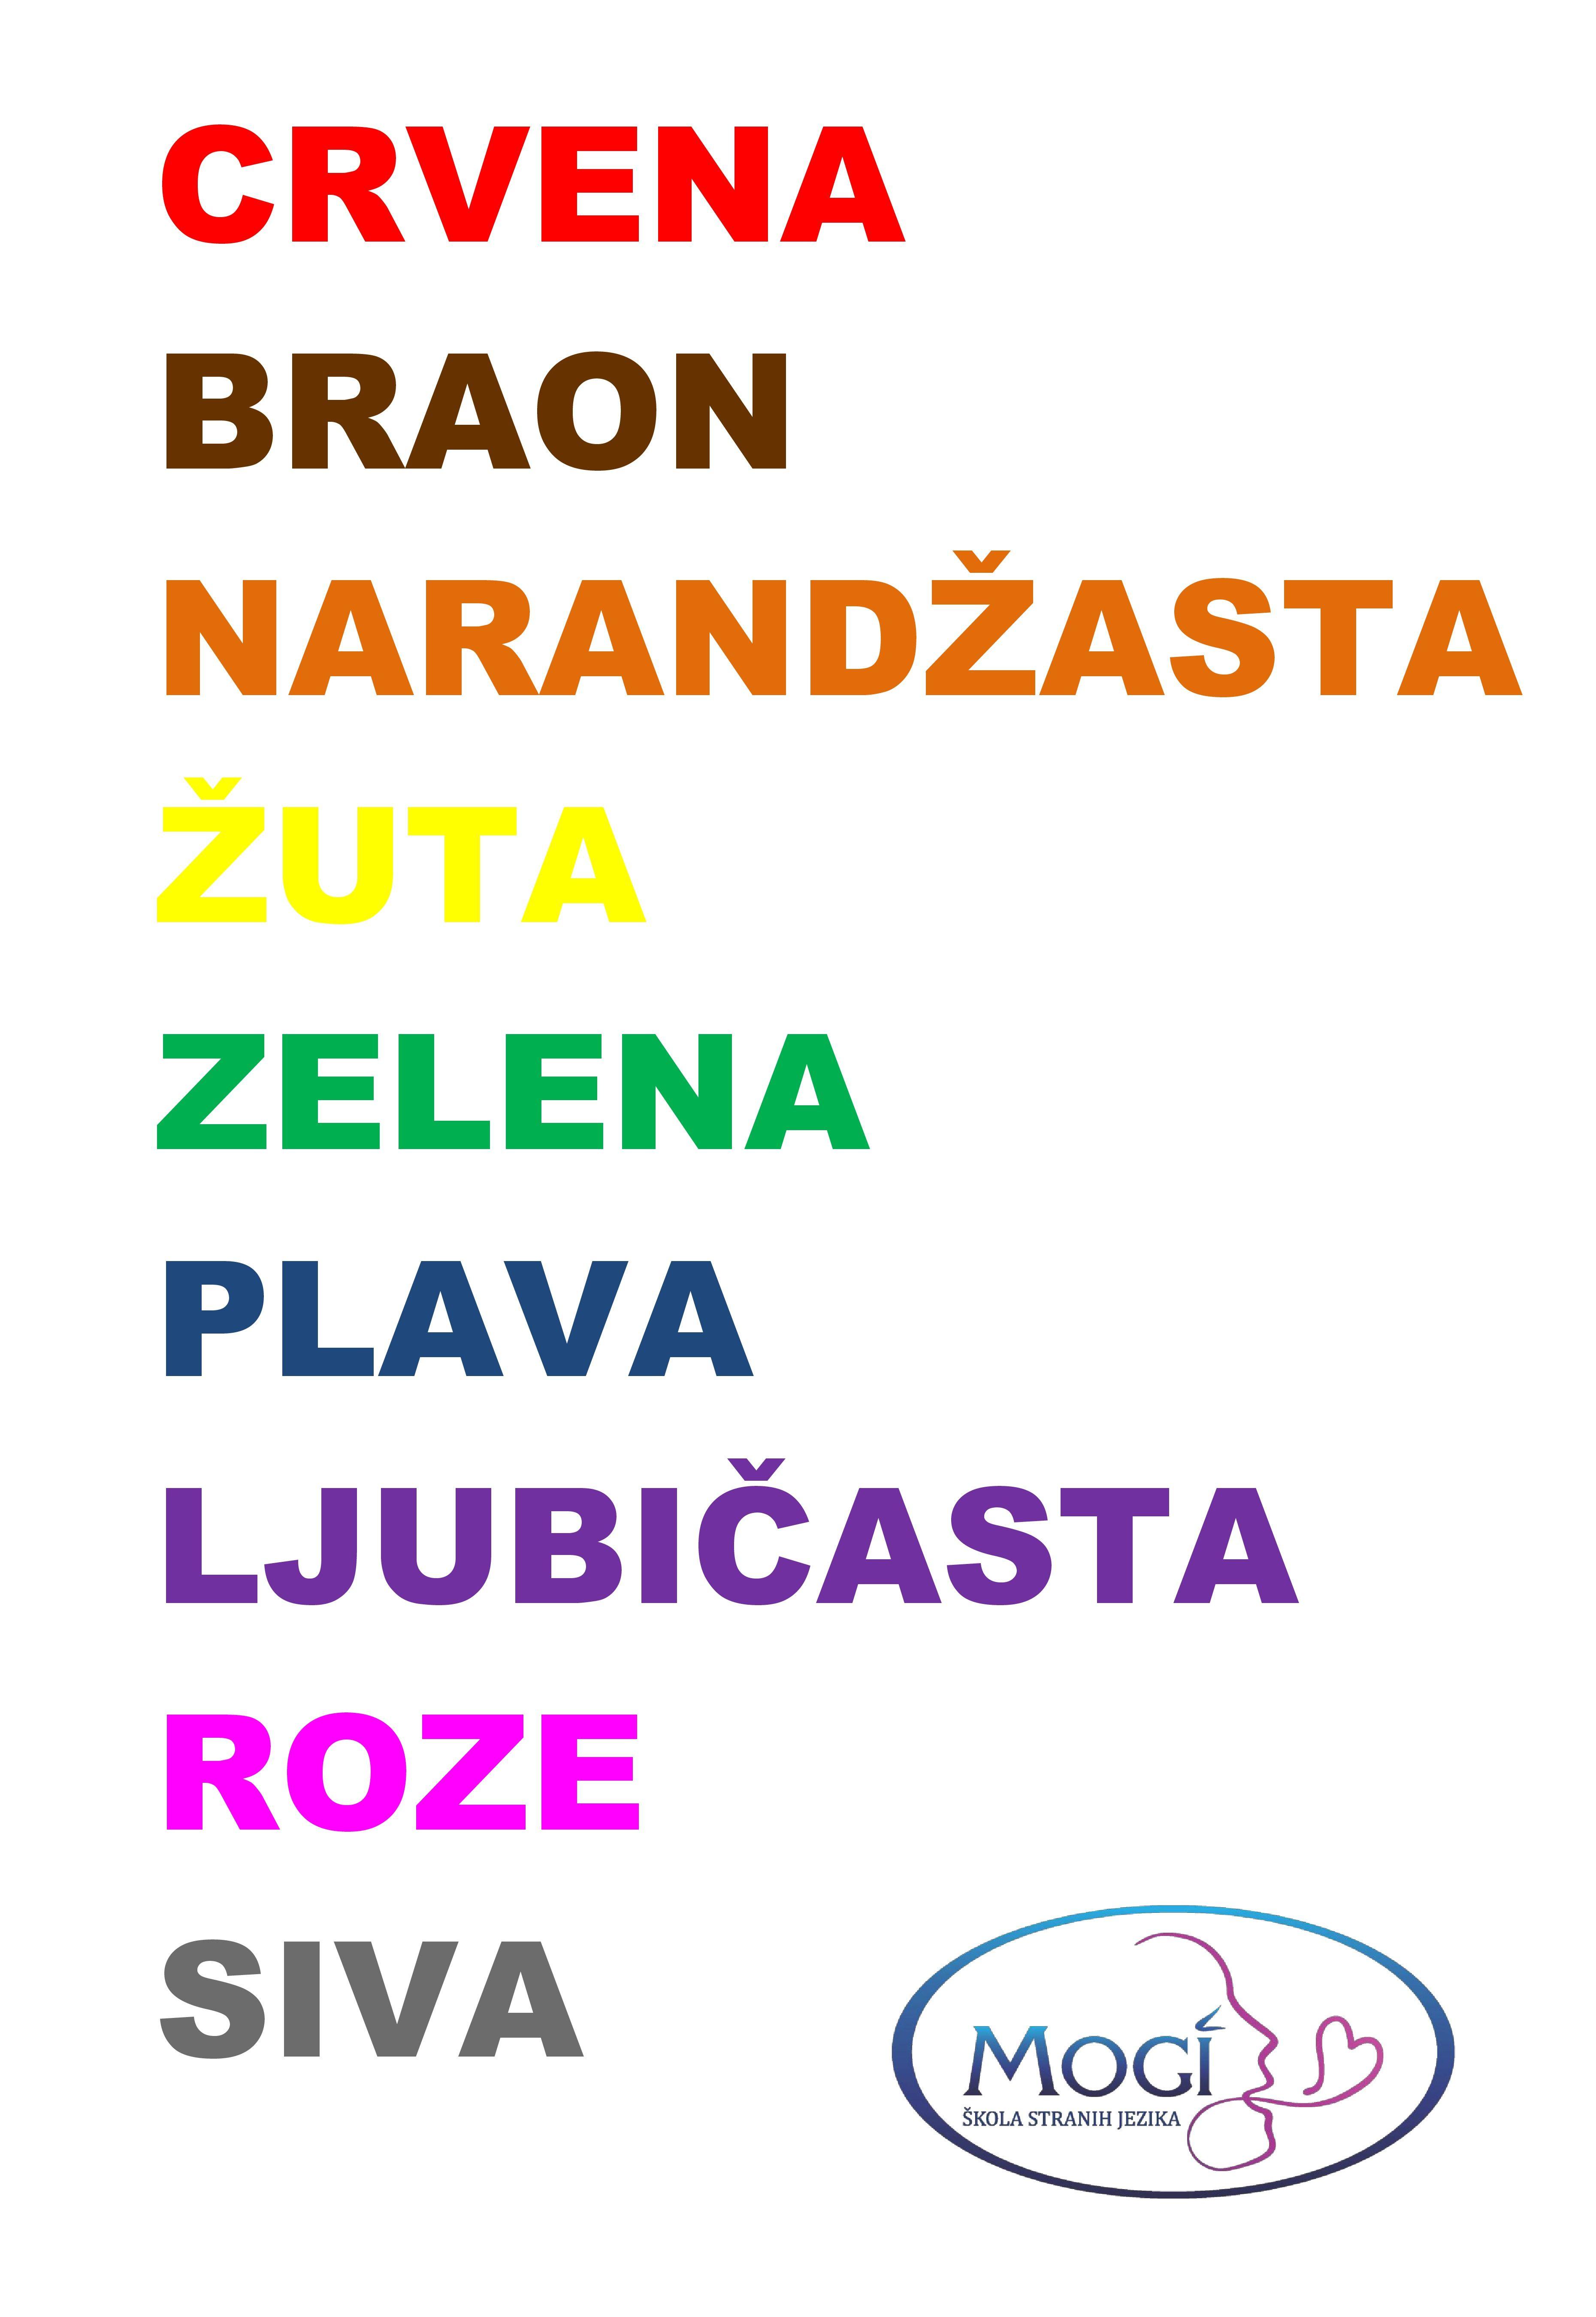 Learn To Speak German Learn To Speak Polish Learn To Speak Croatian Hrvatski Deutsch Polski German Lesson Language Learning Organization Languages Online